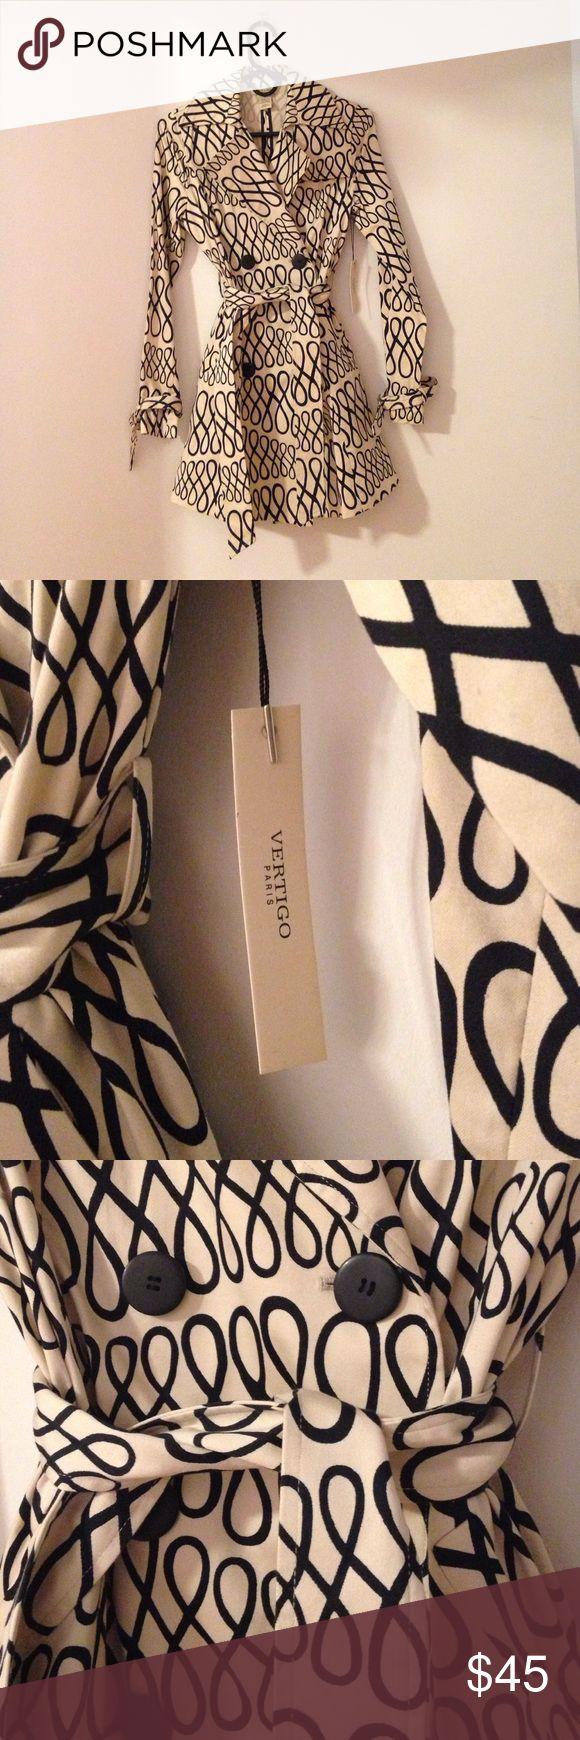 Never warn VERTIGO Paris trench coat Light tan and black designer trench coat Vertigo Paris Jackets & Coats Trench Coats